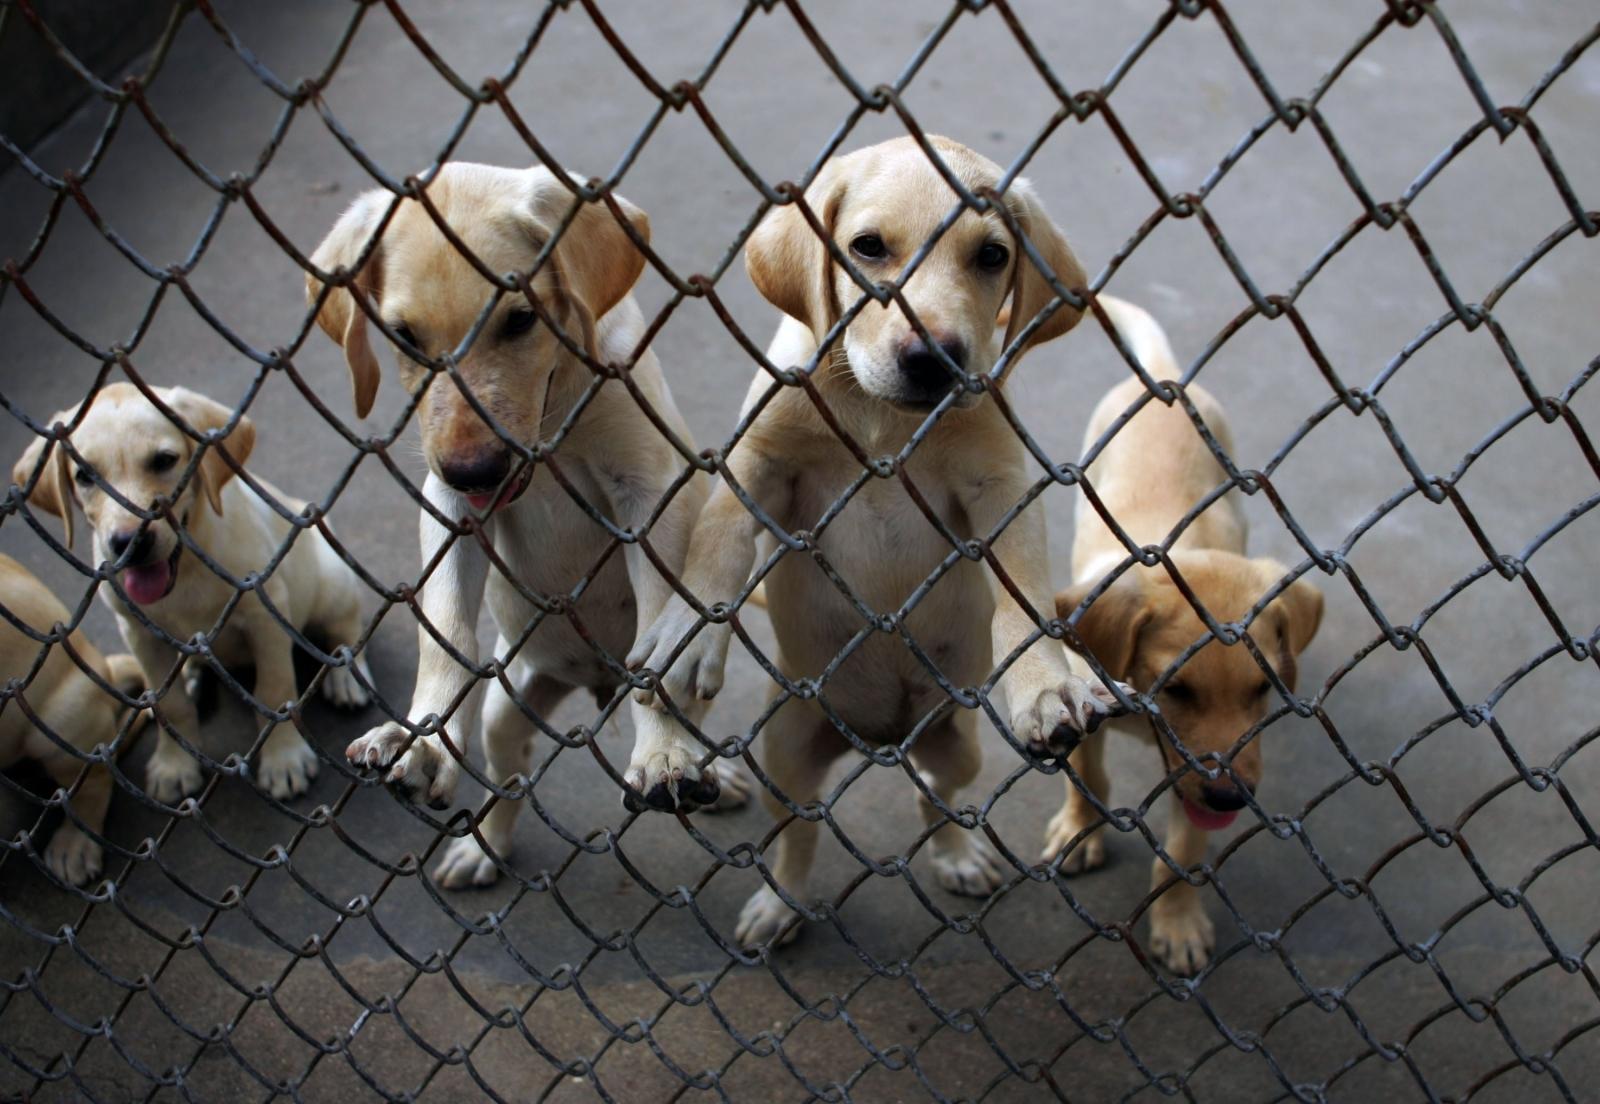 smuggled puppies